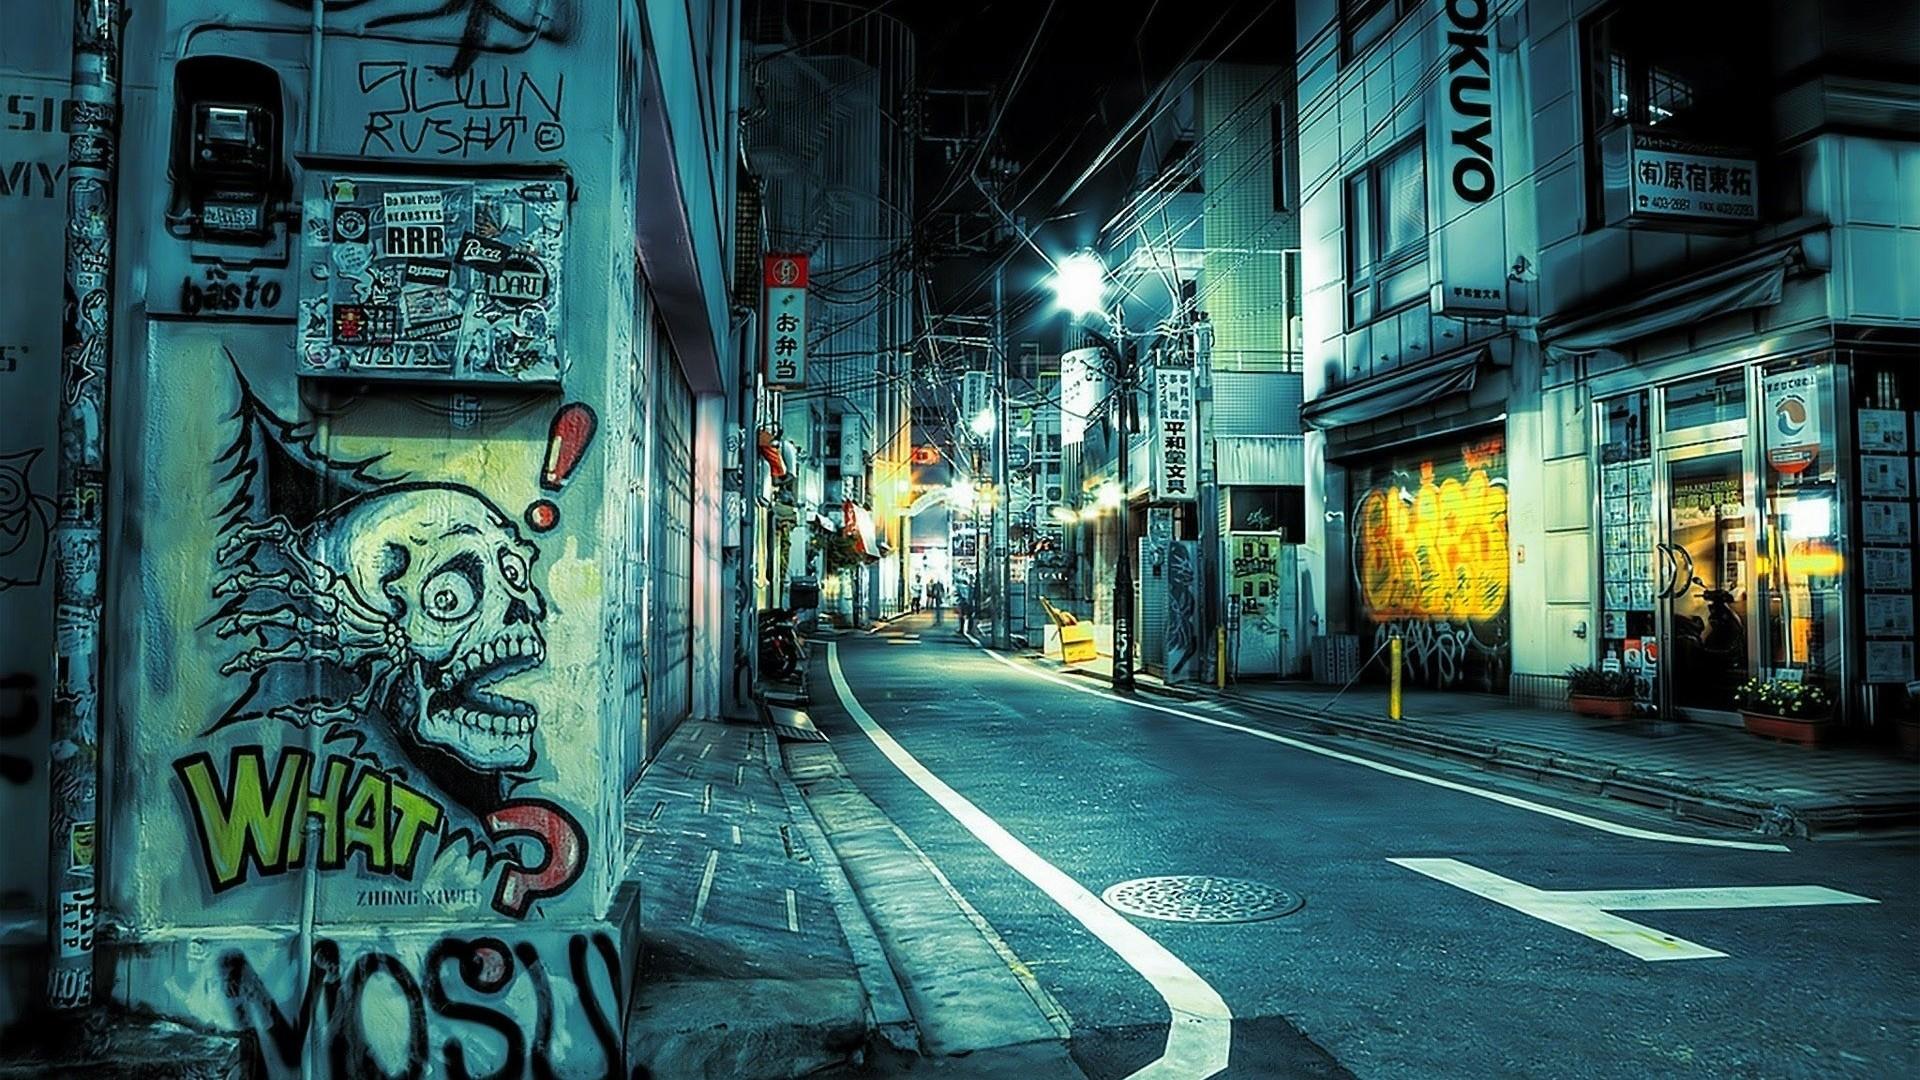 wonderful hd street image